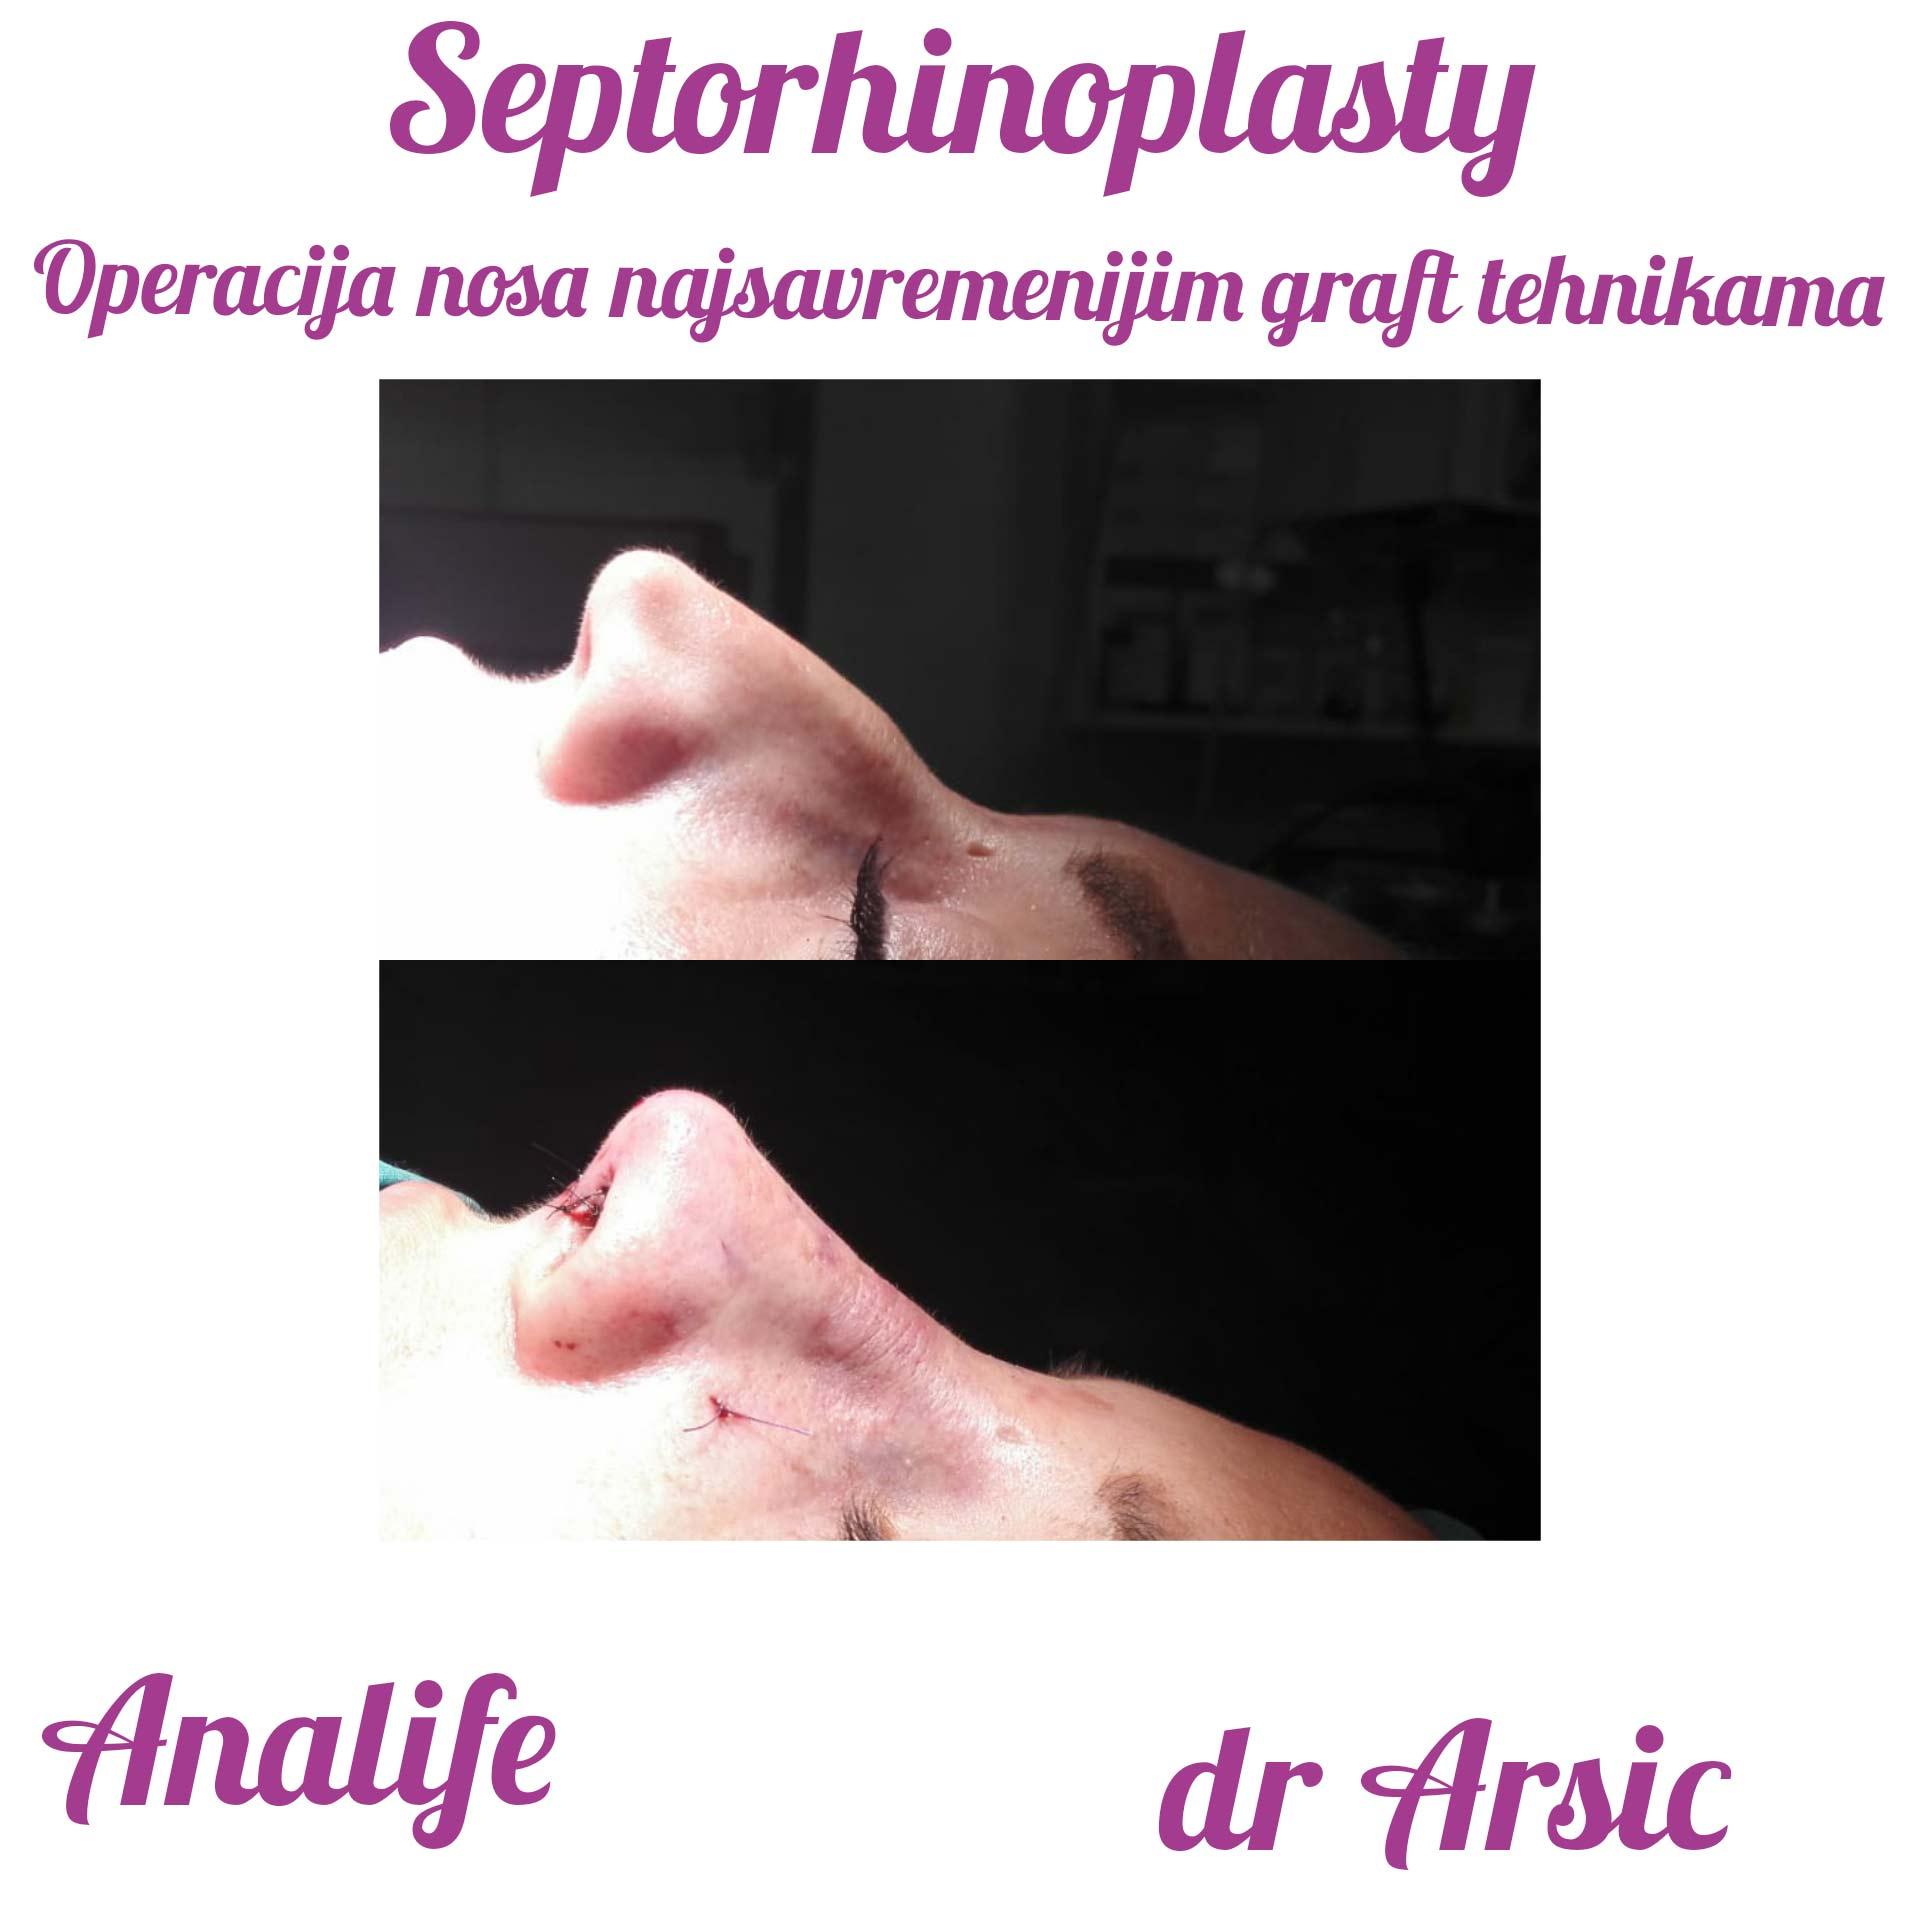 Operacije Nosa - Fantastican rezultat!